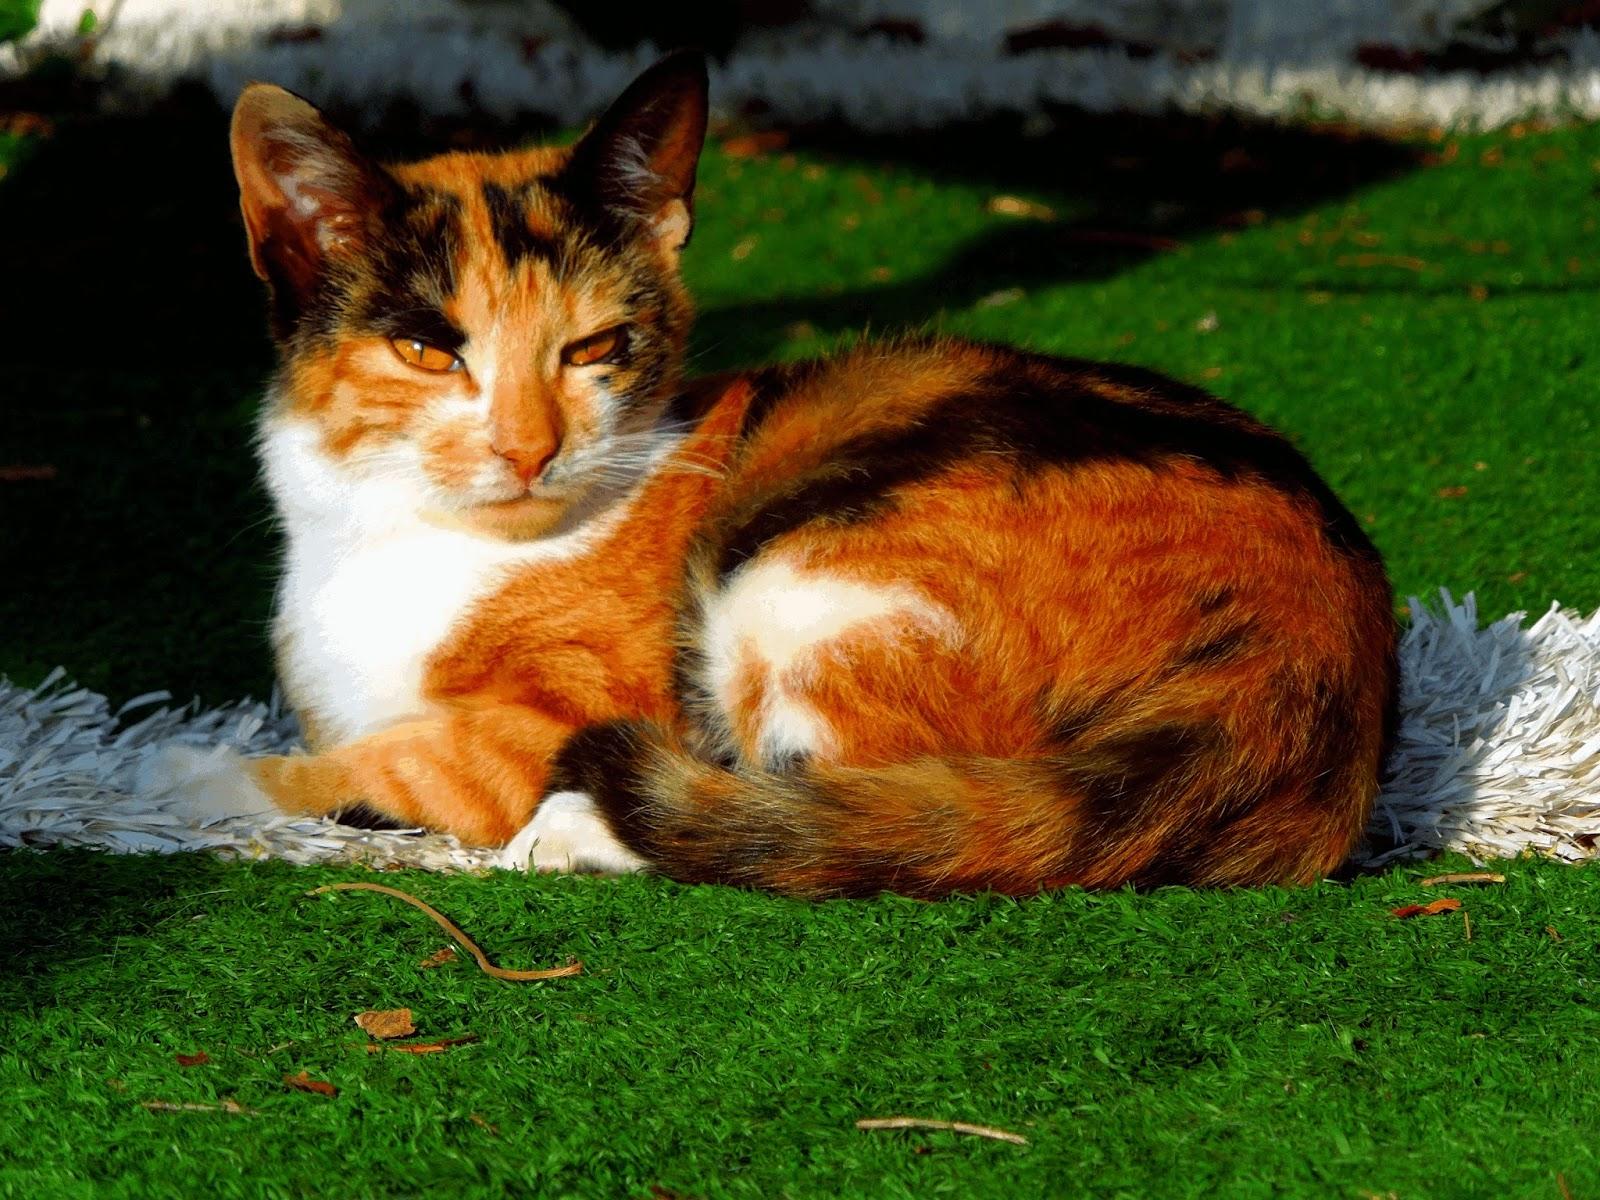 gatto randagio animale felino